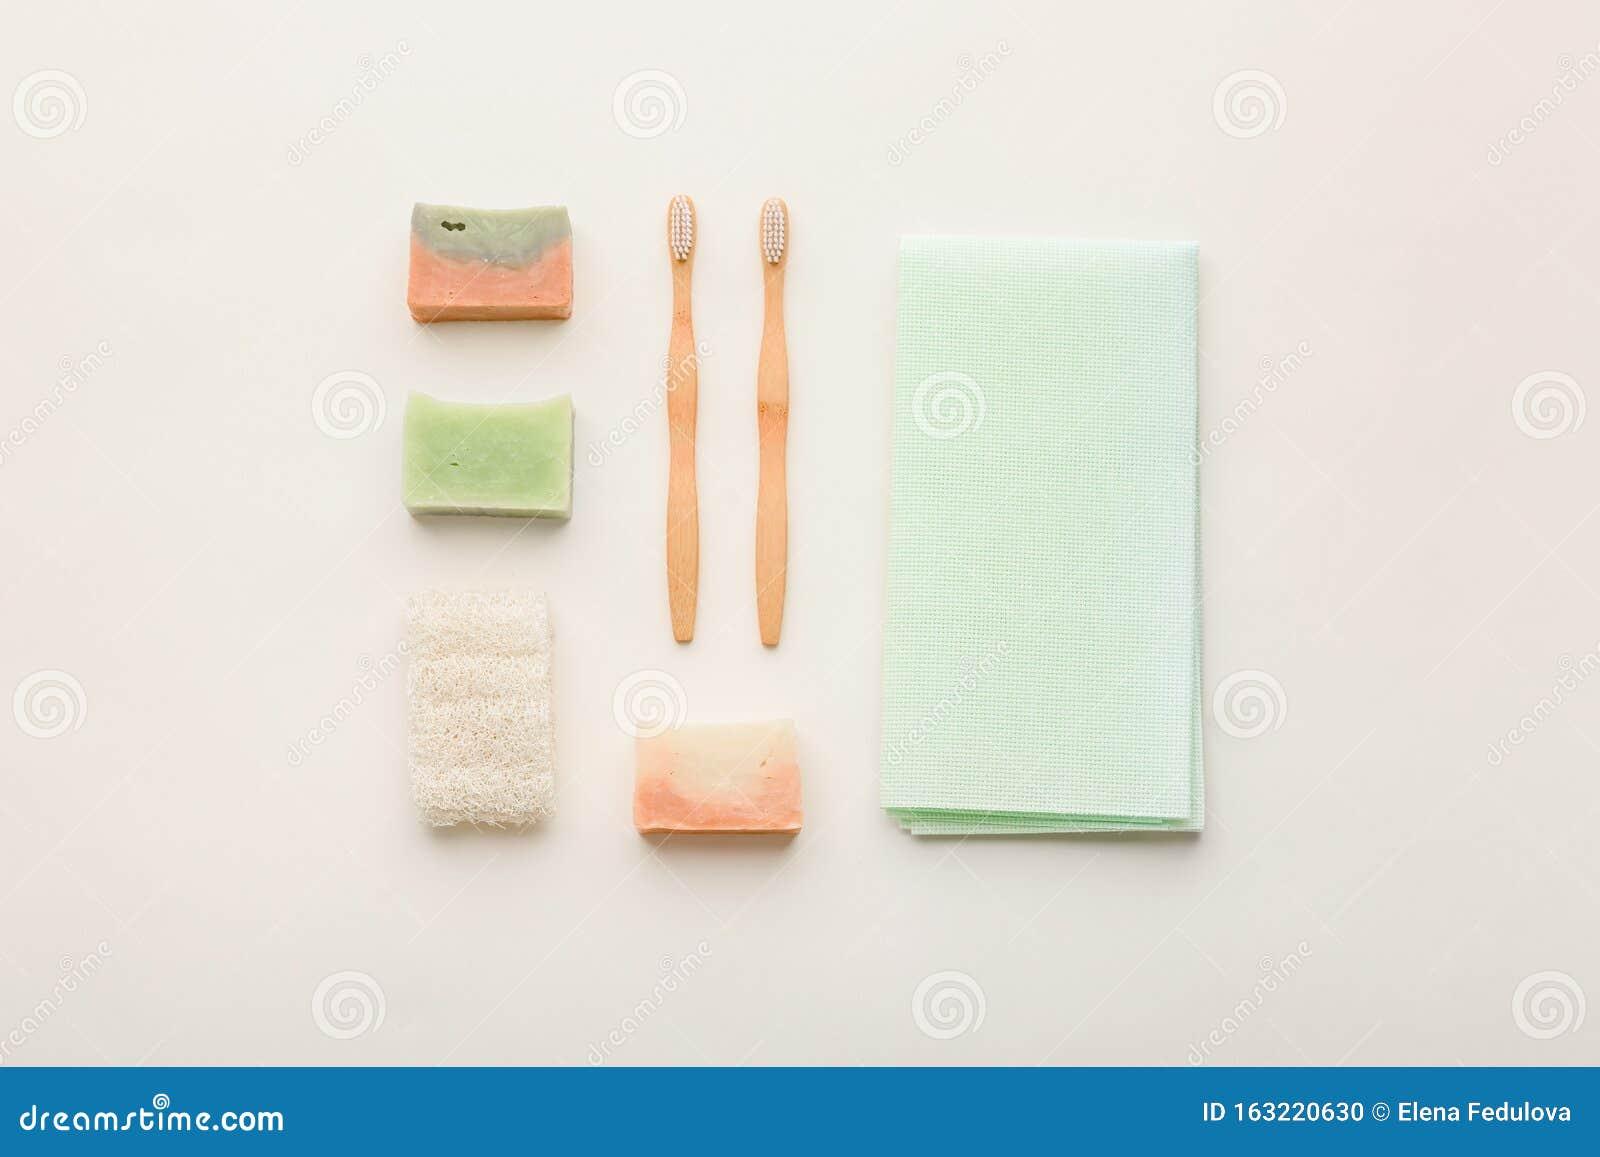 zero waste beauty body care items bathroom essentials in